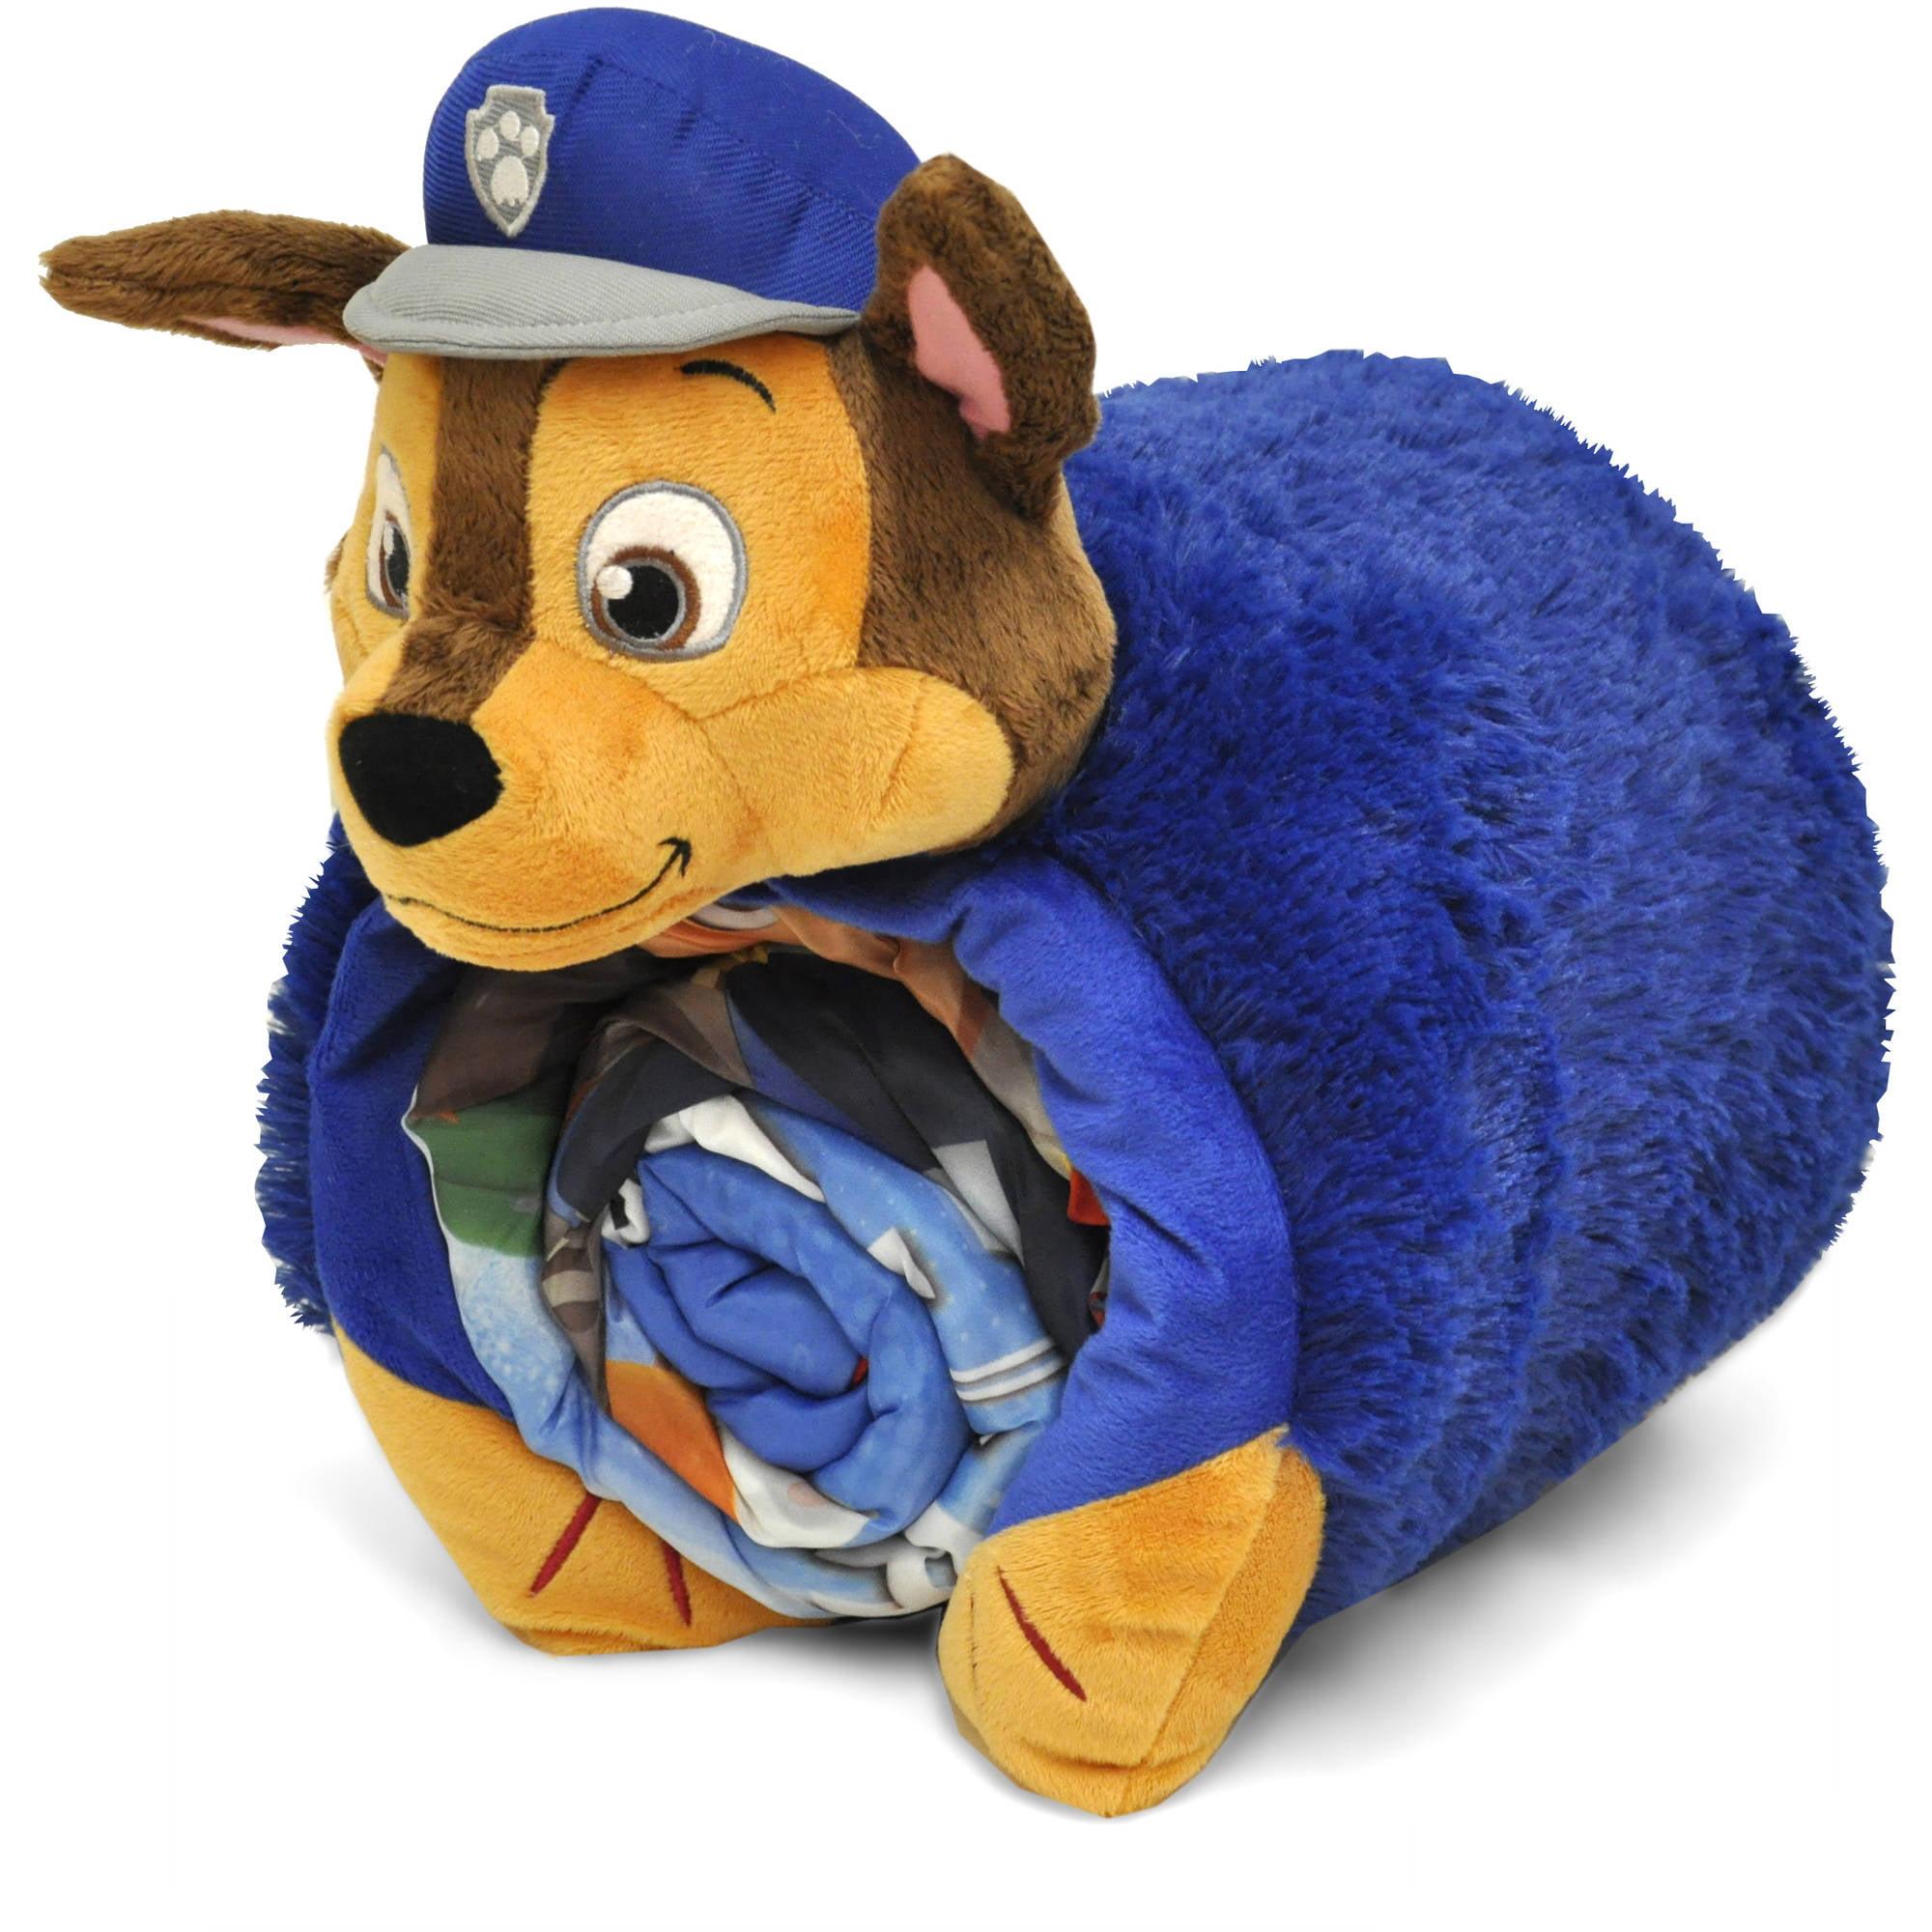 Paw Patrol Sleeping Bag with BONUS Cuddle Pillow